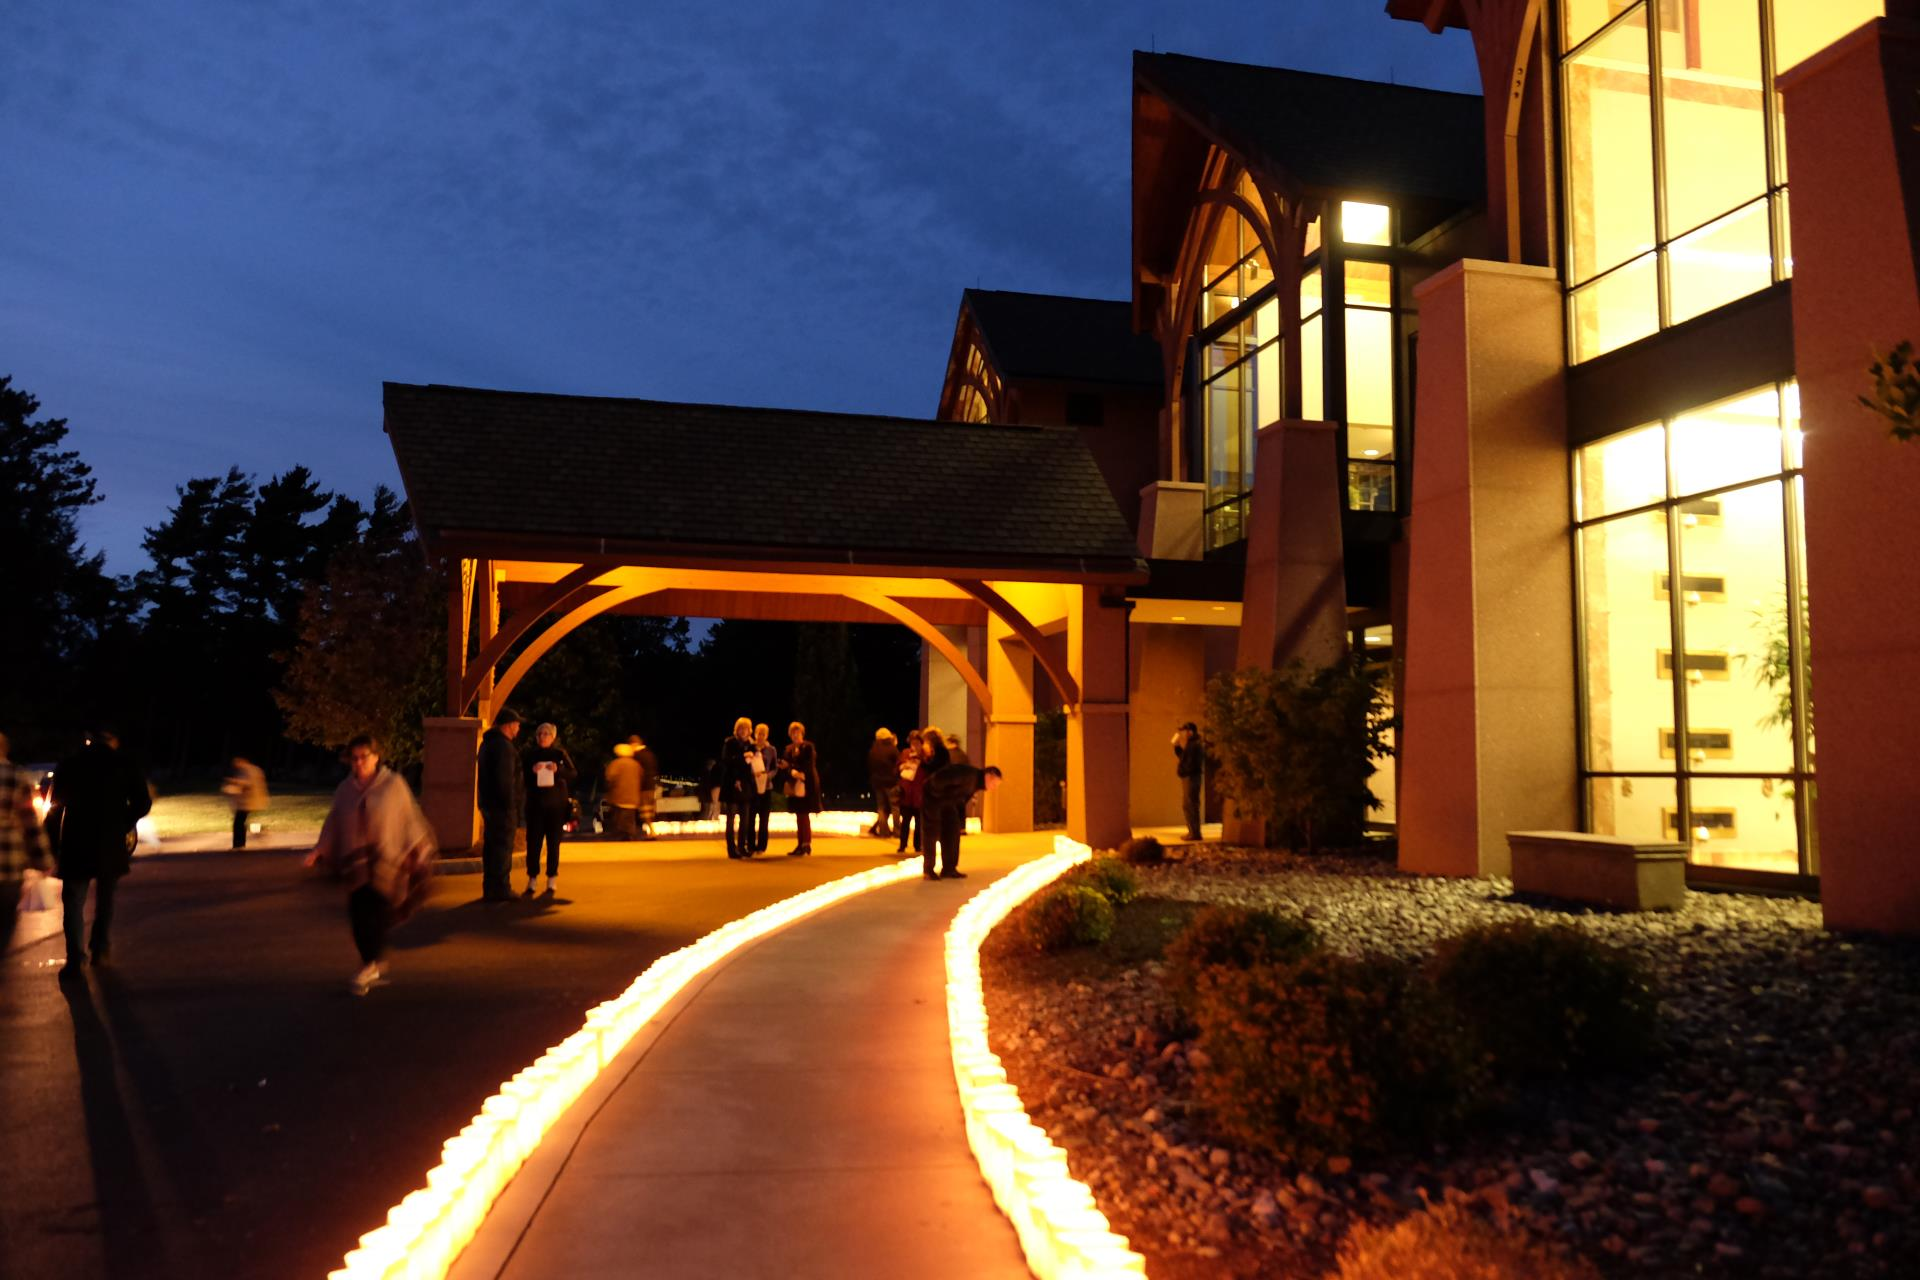 Photo of Lanterns lining a walkway at night